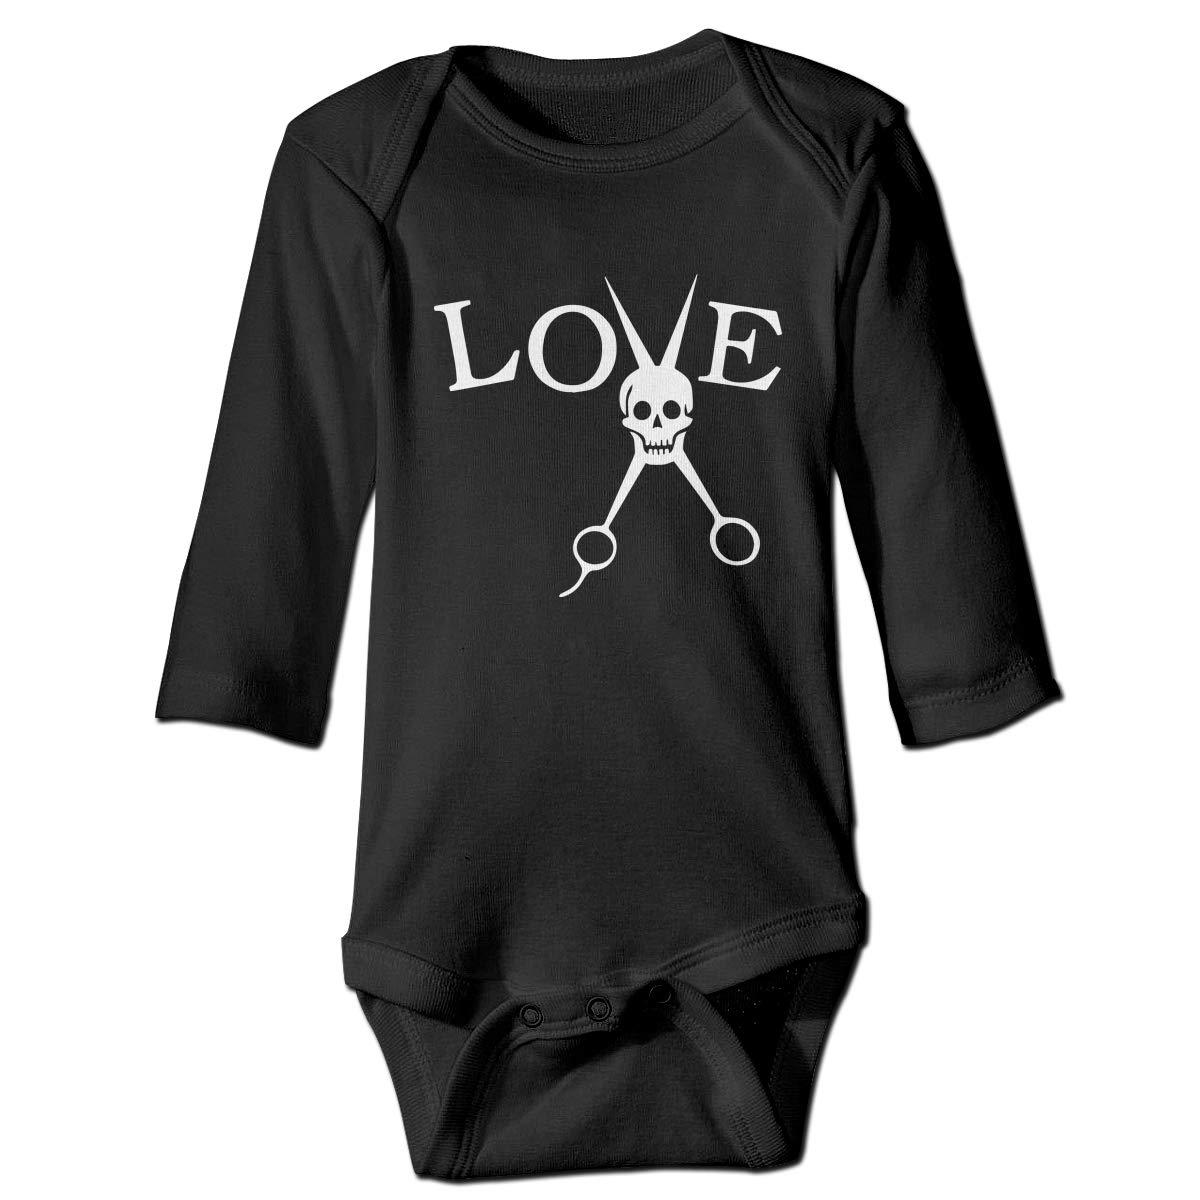 Newborn Barber Hair Stylist Love Skull Long Sleeve Climbing Clothes Playsuit Suit 6-24 Months